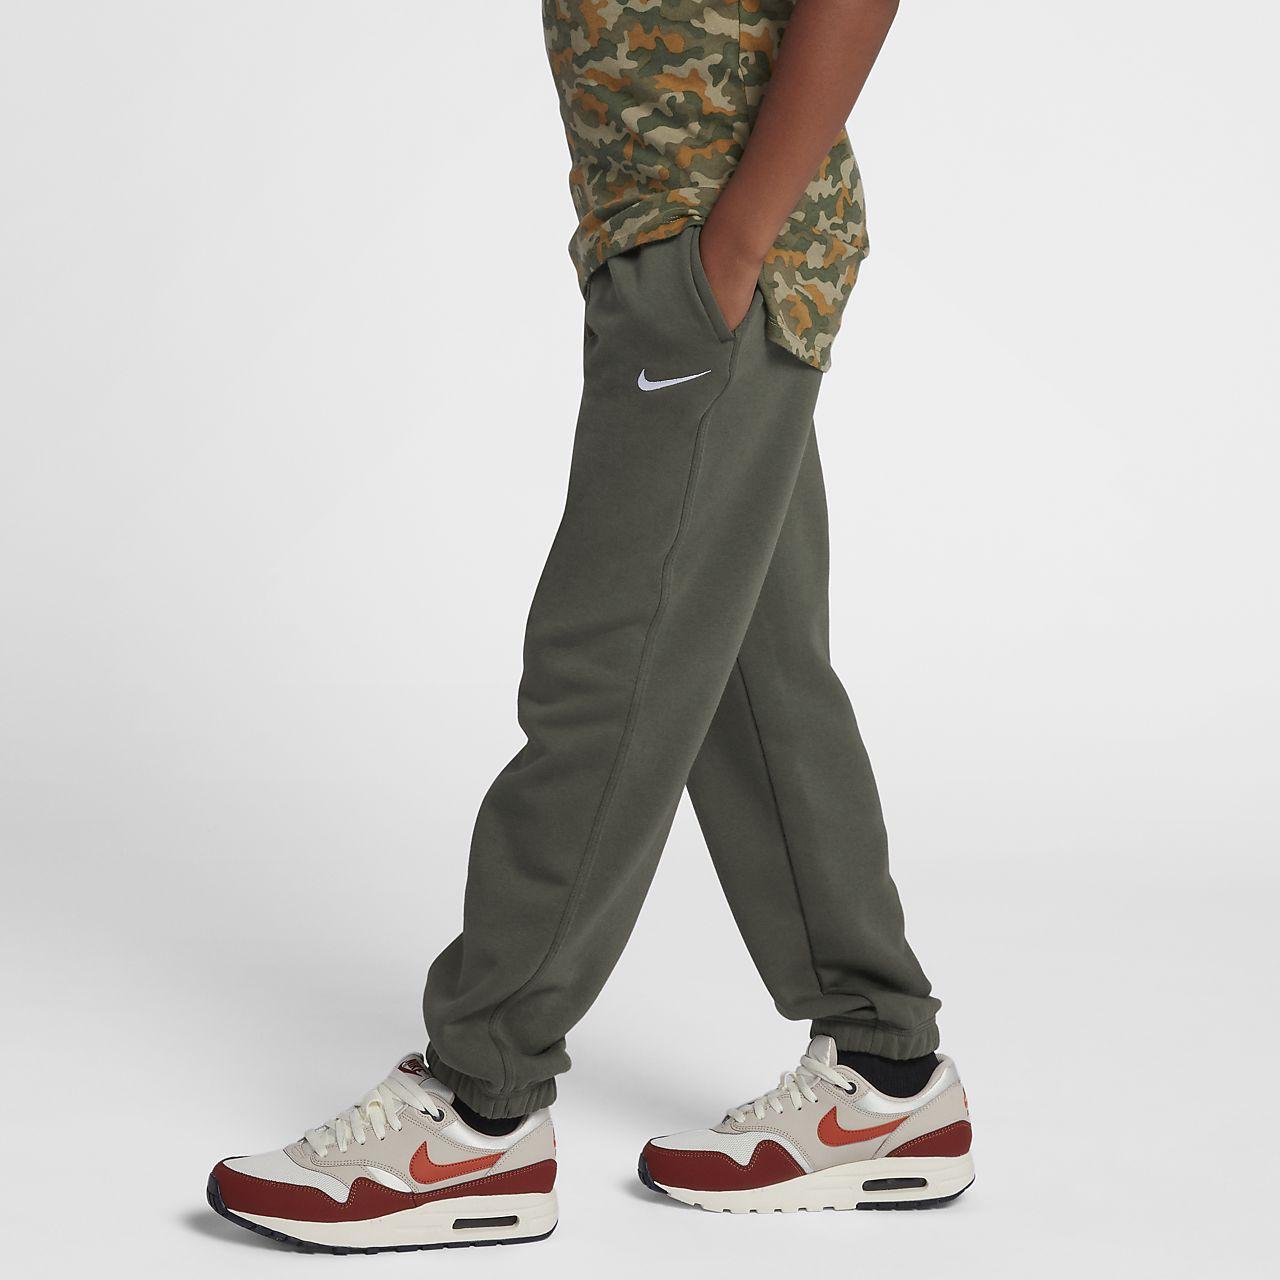 Joggingbroek Jongens.Nike Brushed Fleece Cuffed Joggingbroek Jongens Nike Com Nl